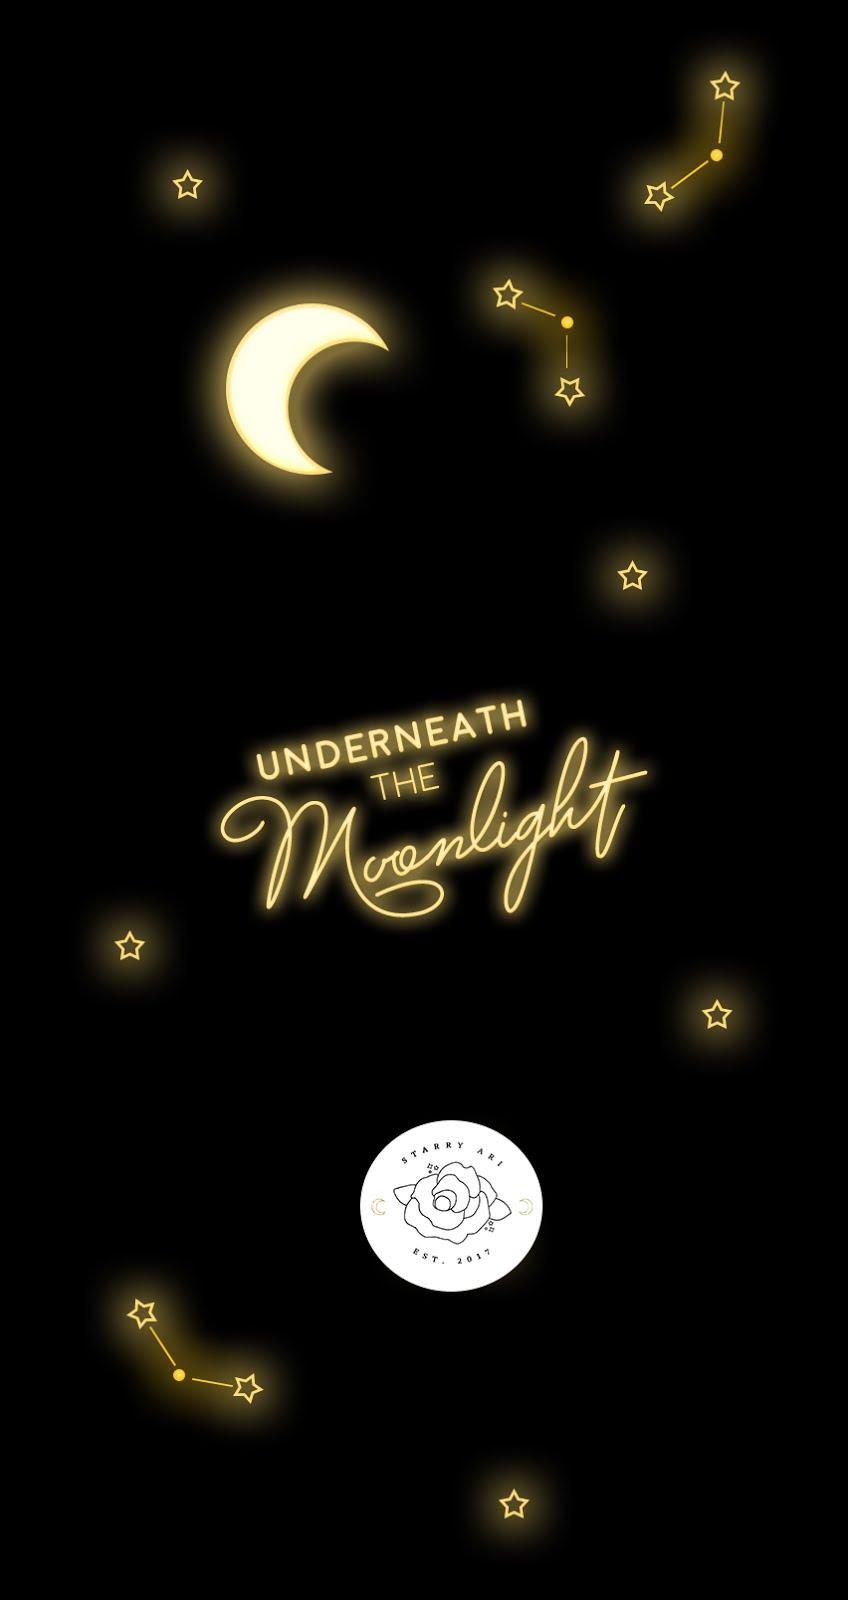 Free Dreamy Phone Wallpaper Underneath The Moonlight